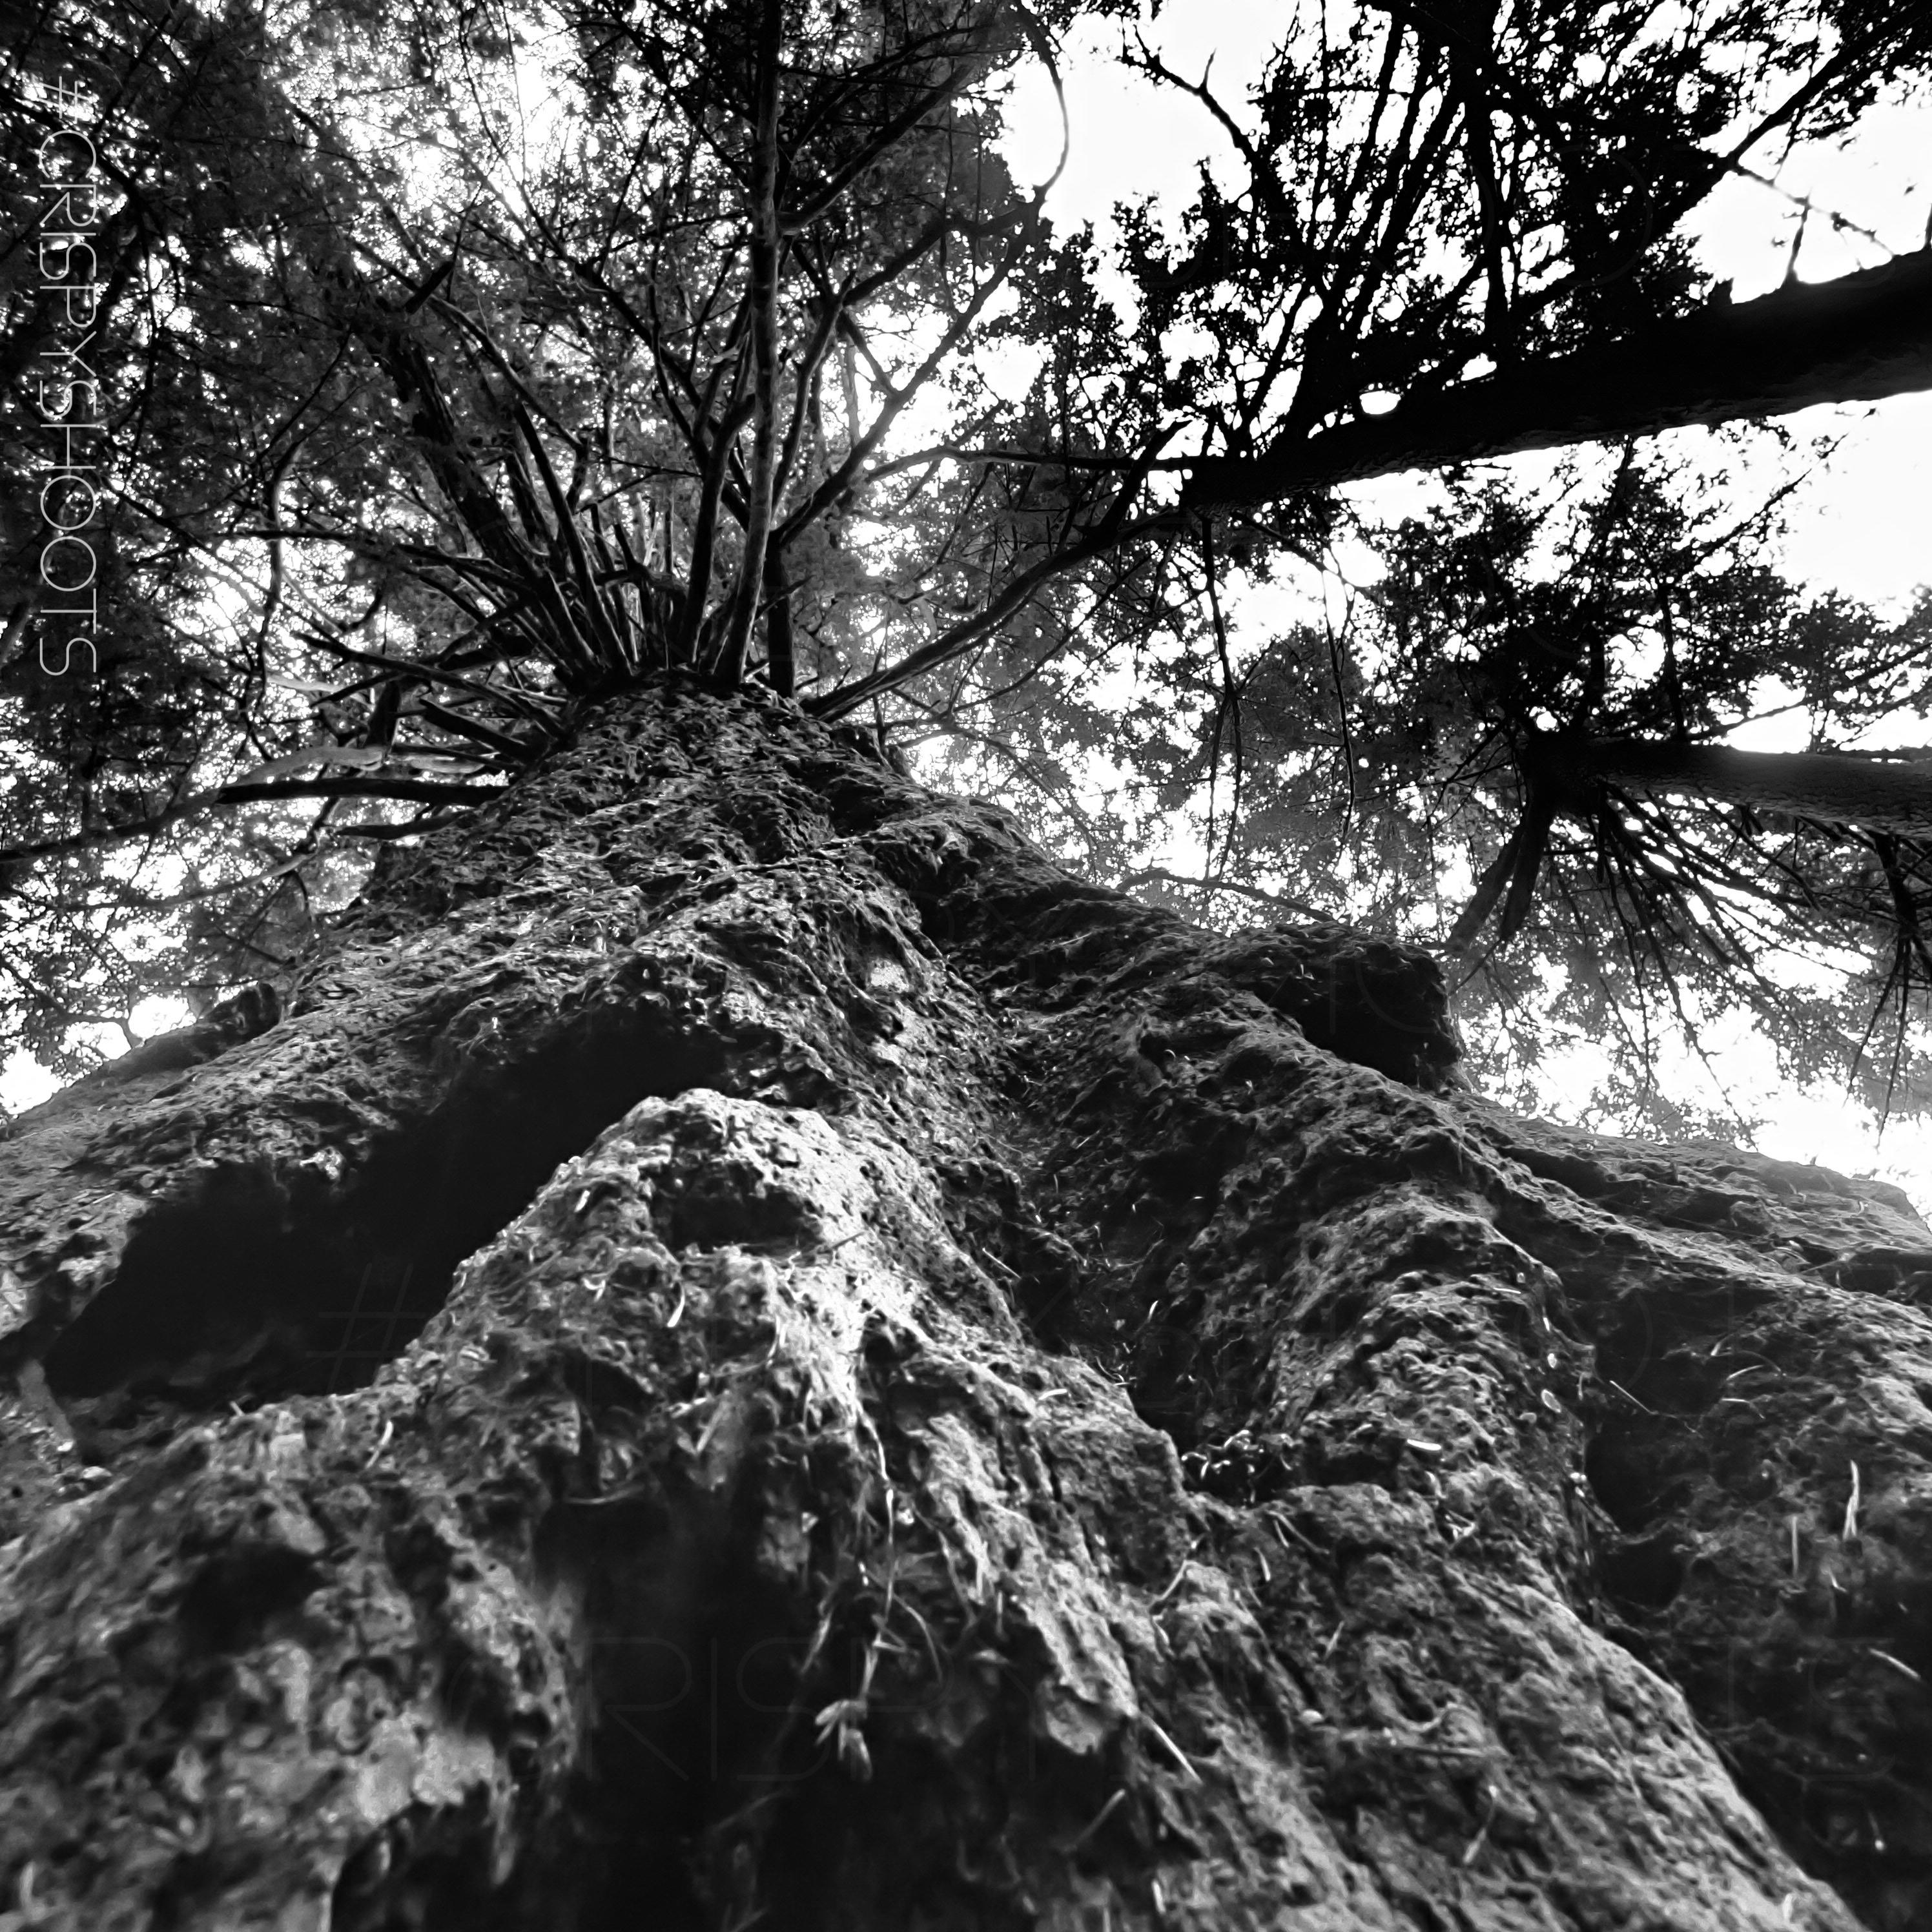 Mountaineer Tree